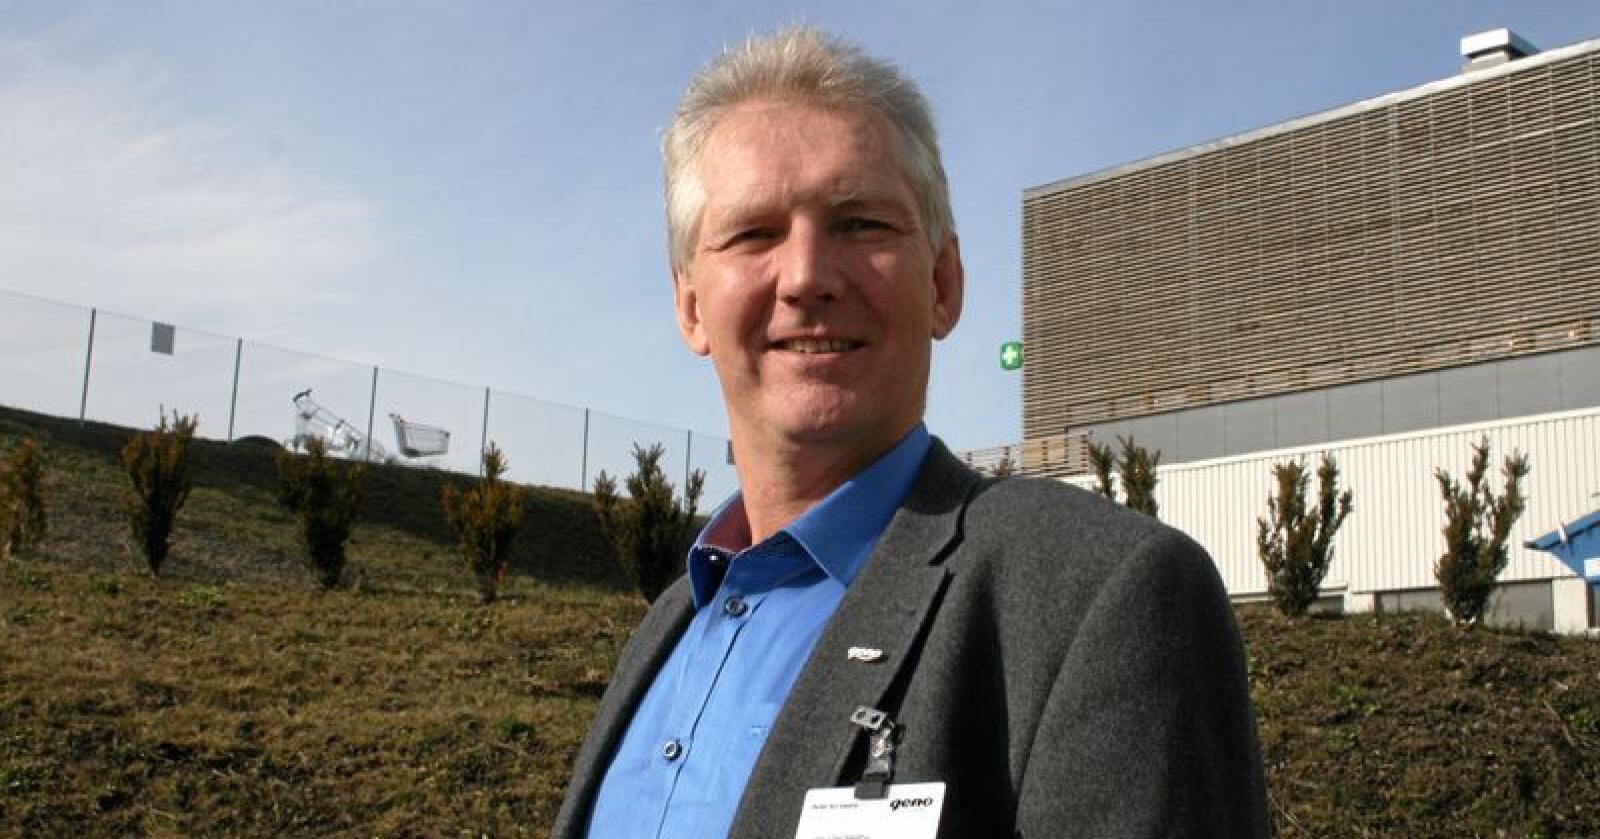 Attvald: Jan Ole Mellby er attvald som styreleiar i bondesamvirket Geno. Foto: Bjarne Bekkeheien Aase